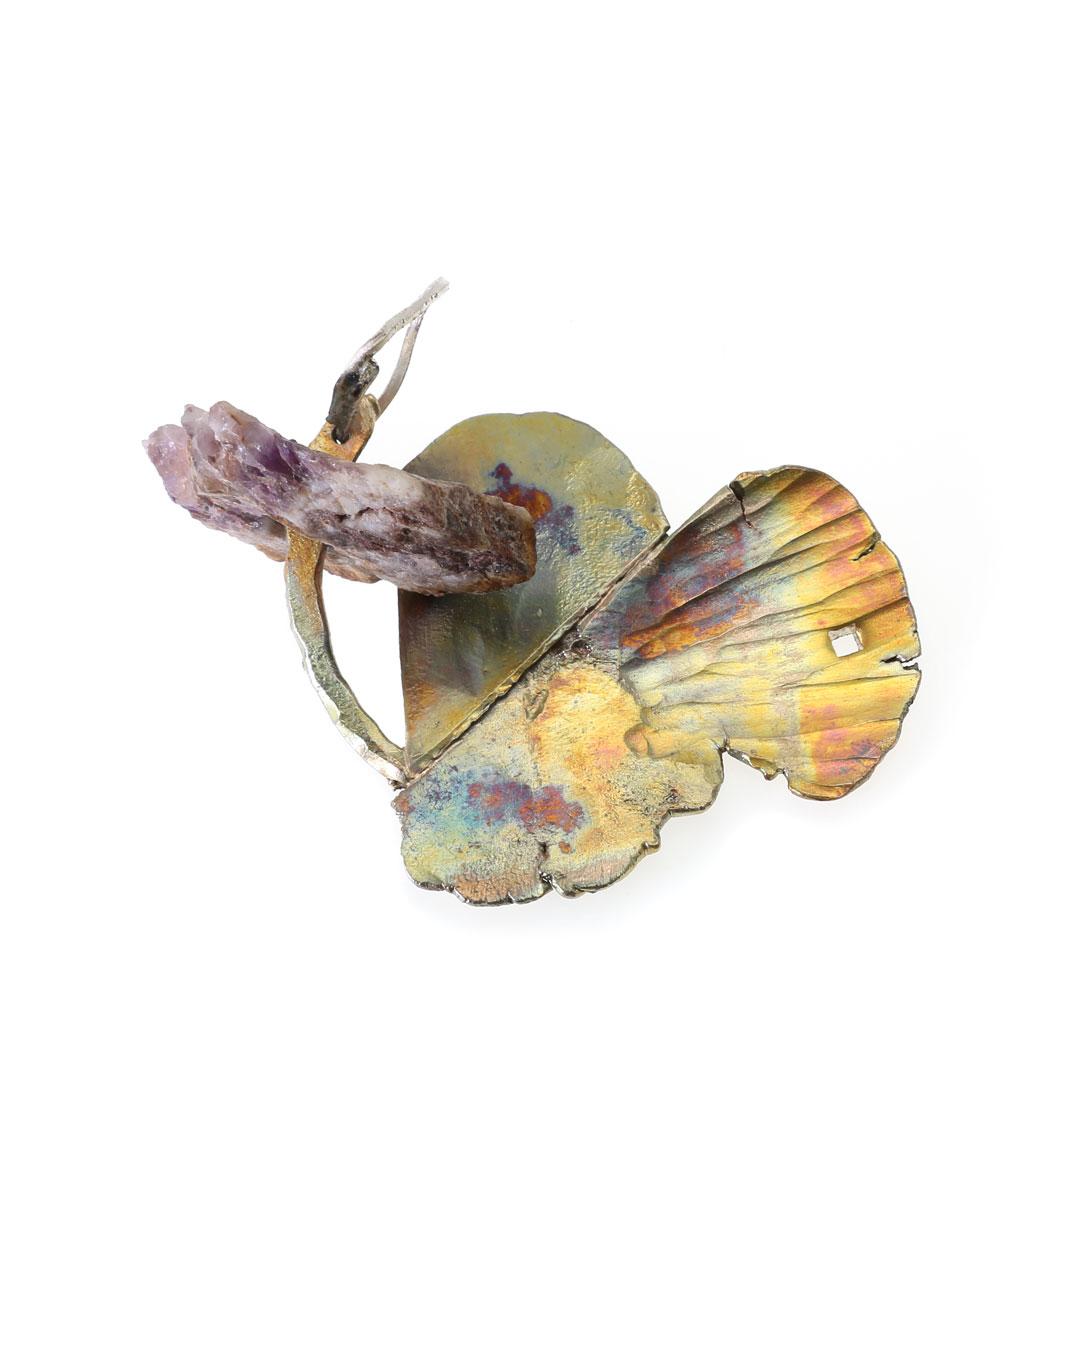 Rudolf Kocéa, Tit, 2017, pendant; silver, copper, rock, 90 x 70 x 30 mm, €1300